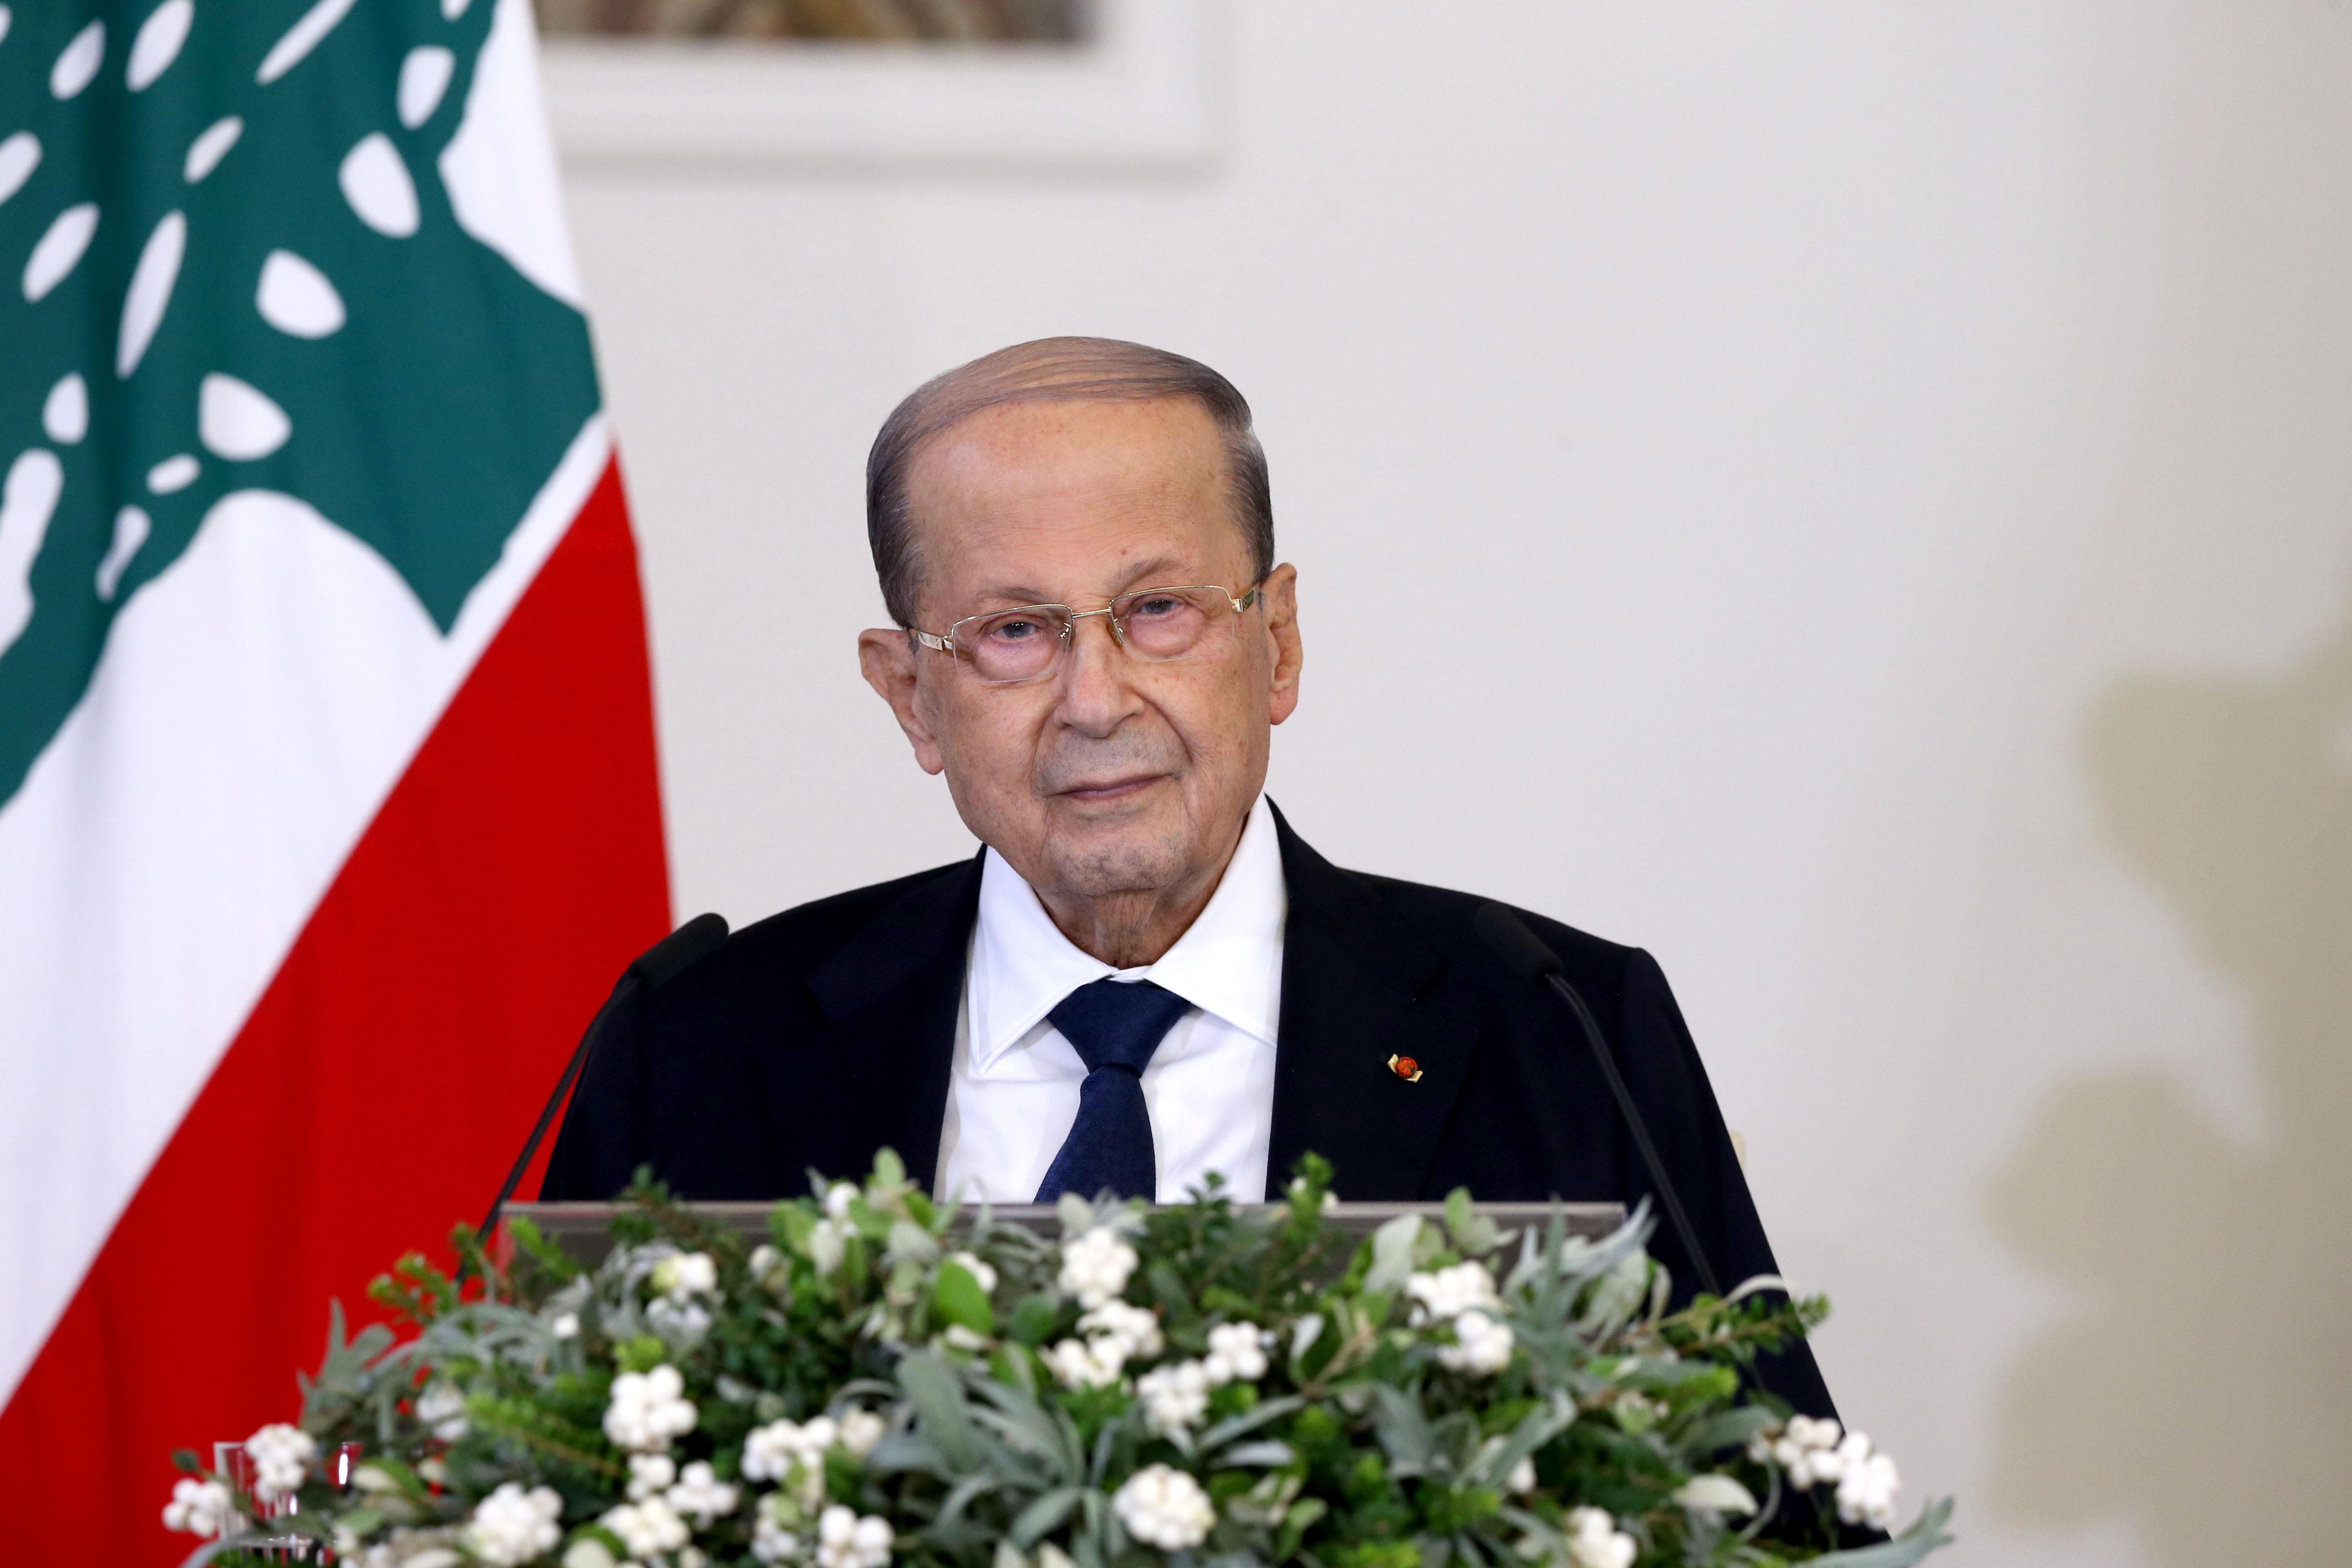 01 - President Michel Aoun press conference 20 oct 2020 (8)